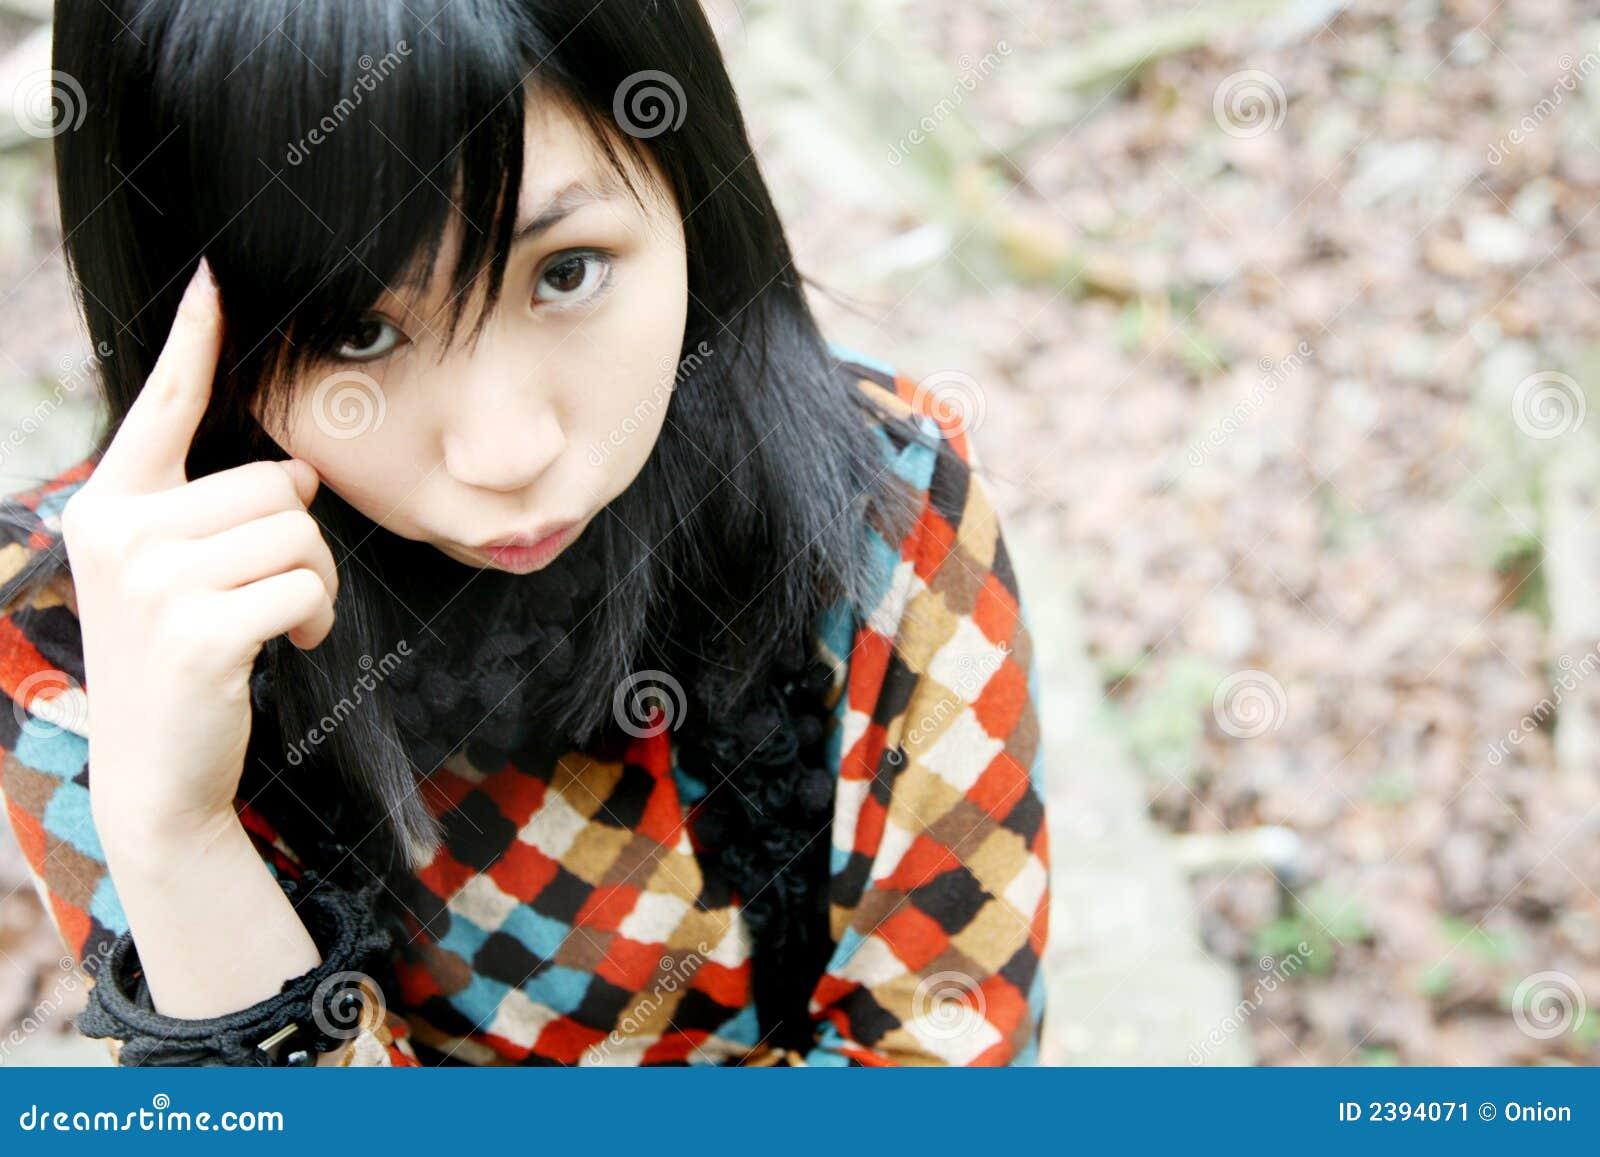 Asian girl looking at viewer